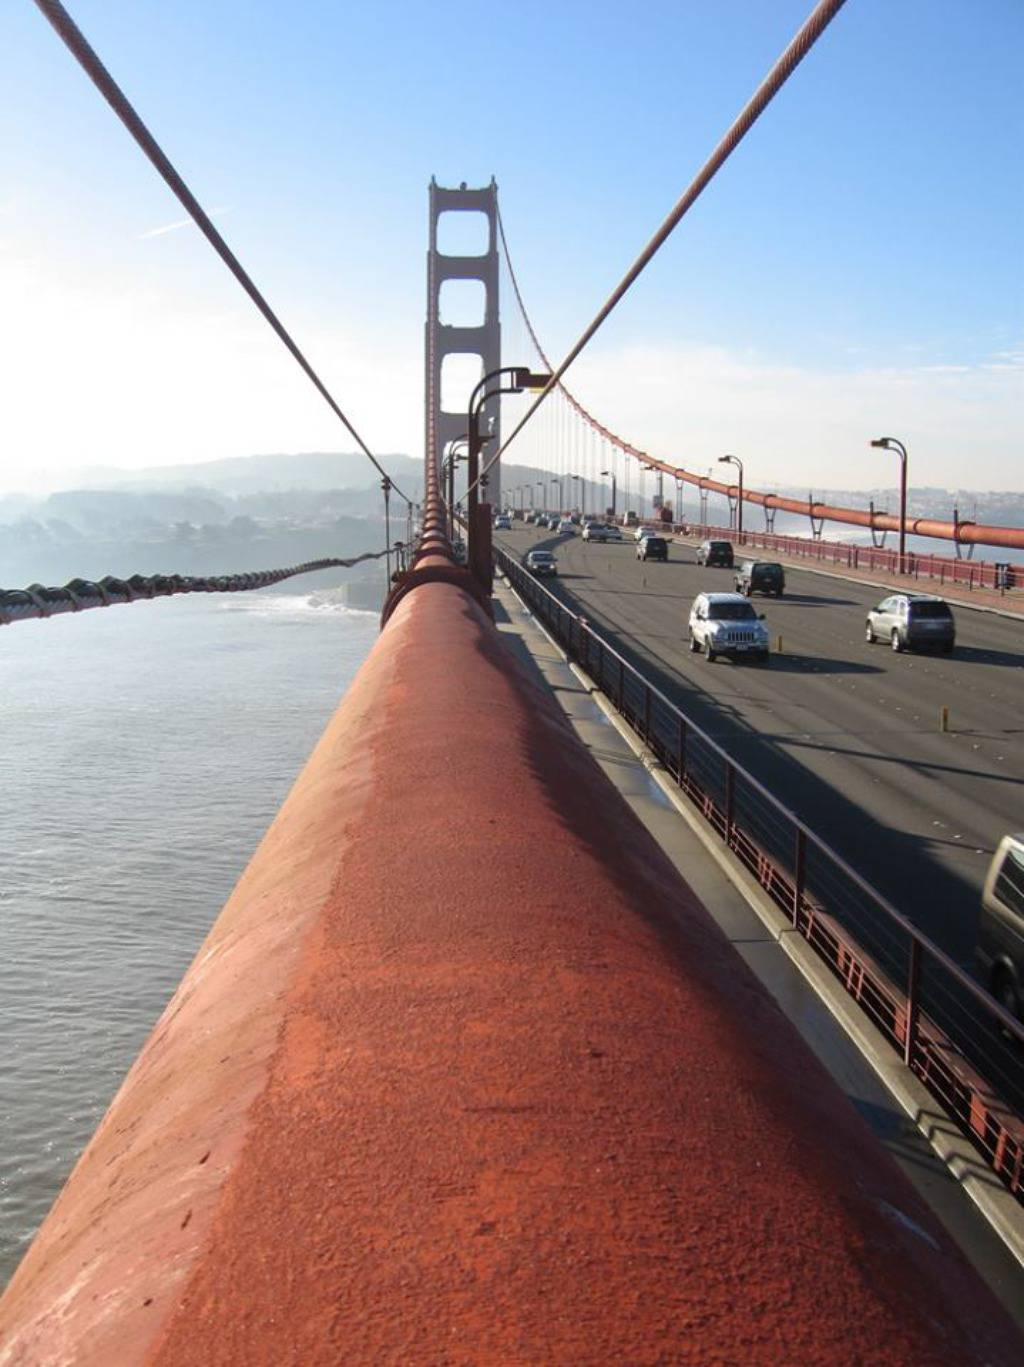 Facebook/Golden Gate Bridge